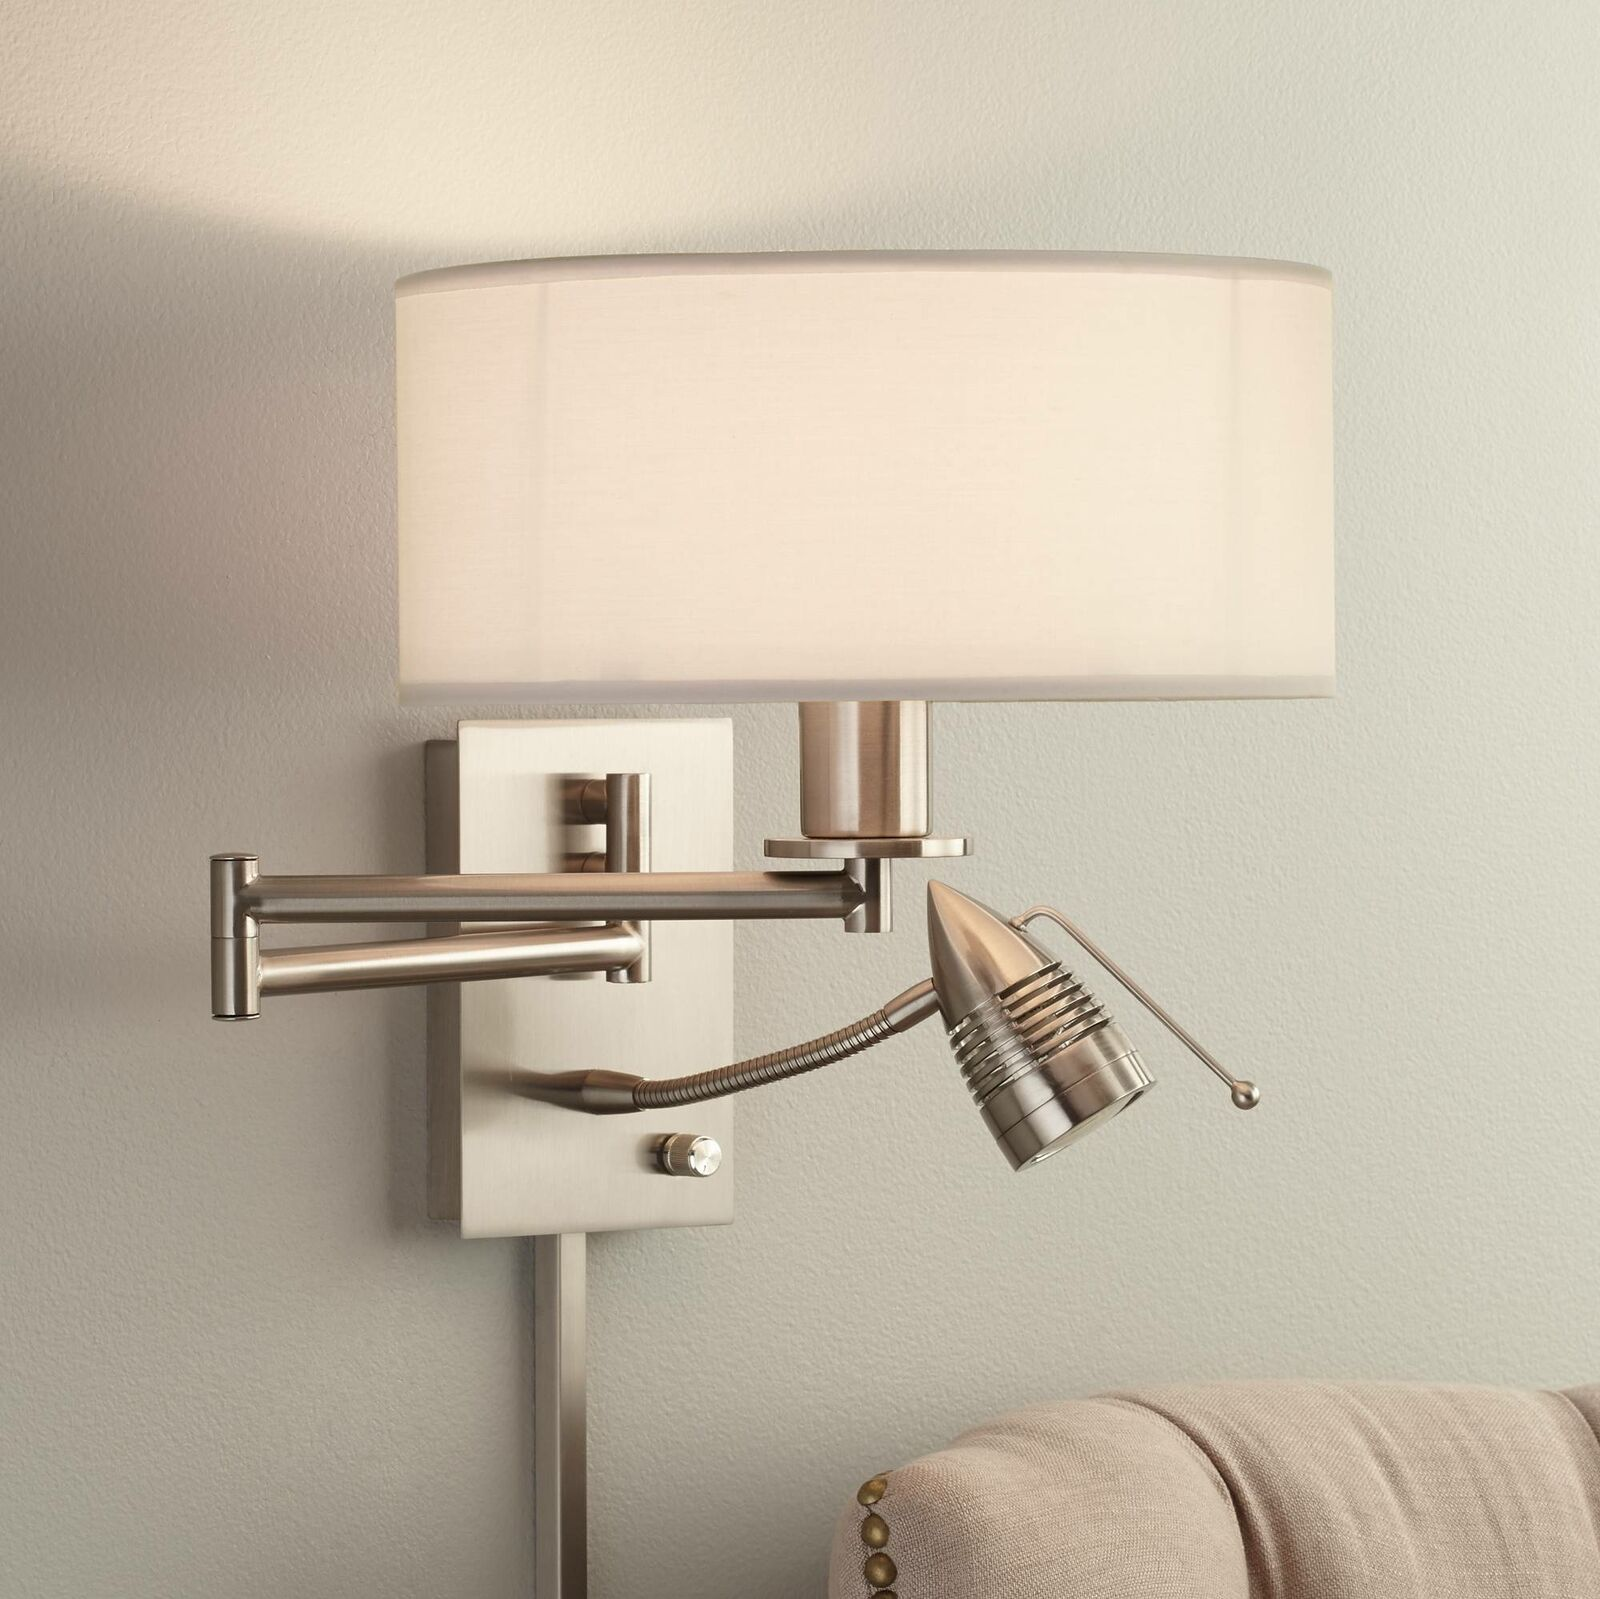 Modern Swing Arm Wall Lamp LED Nickel Plug-In Fixture Bedroom Bedside  Reading